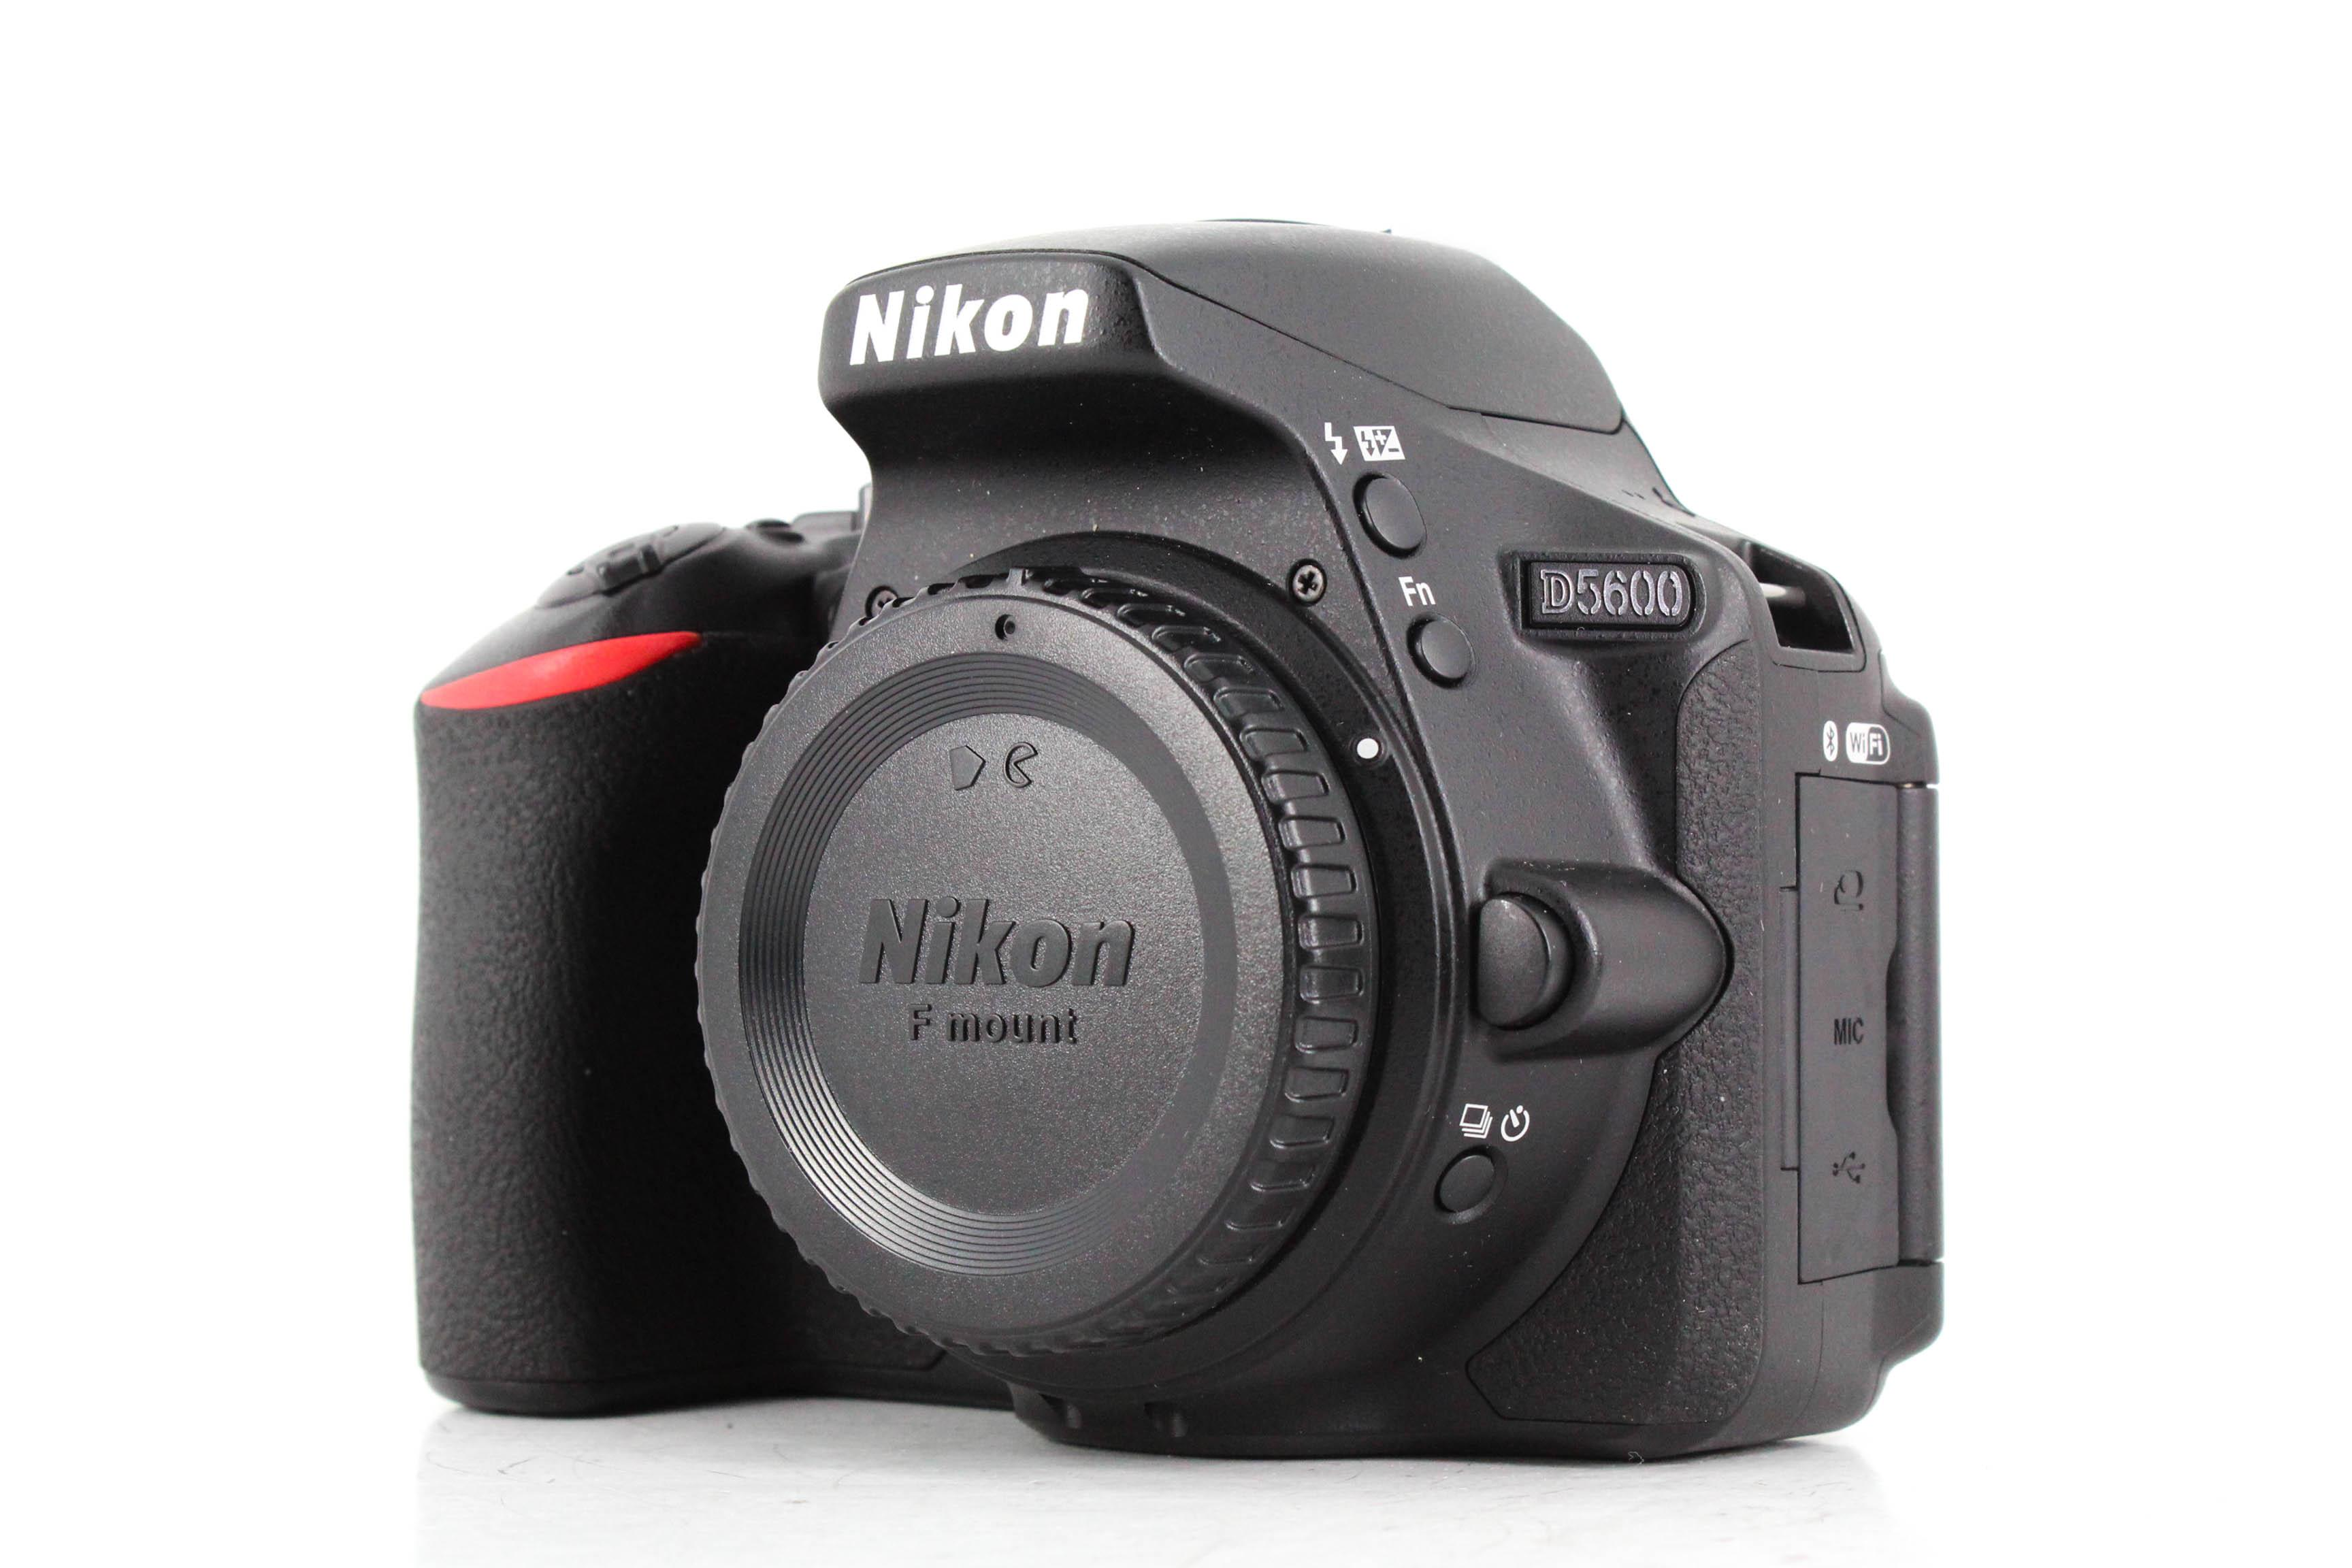 Head to Head: Nikon D5600 vs Canon EOS Rebel T7i